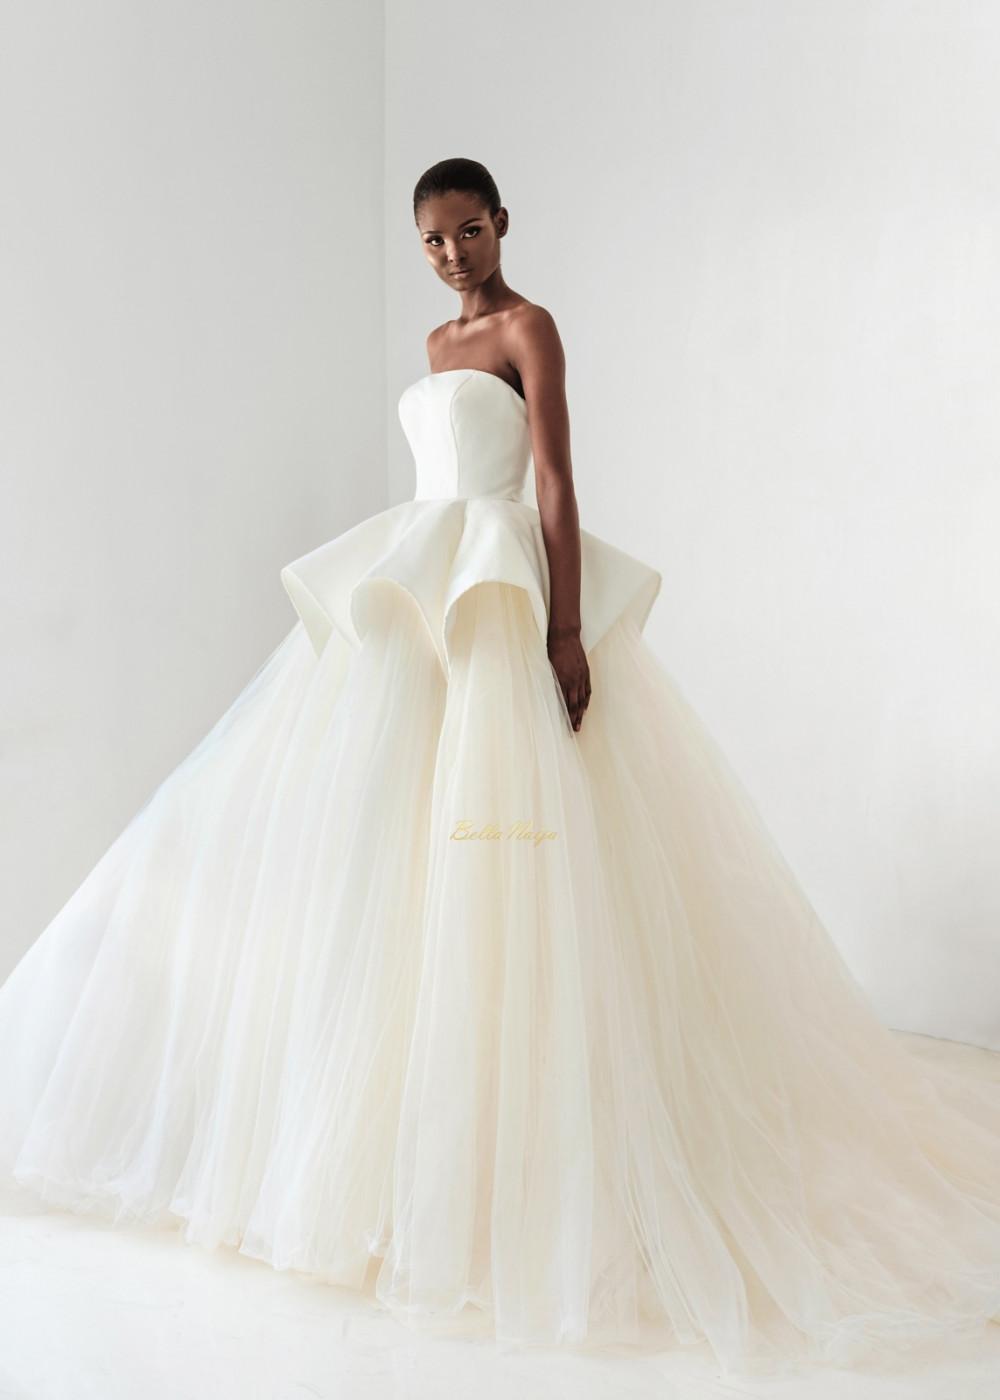 Wedding Dress Steamer 36 Marvelous The Andrea Iyamah bridal